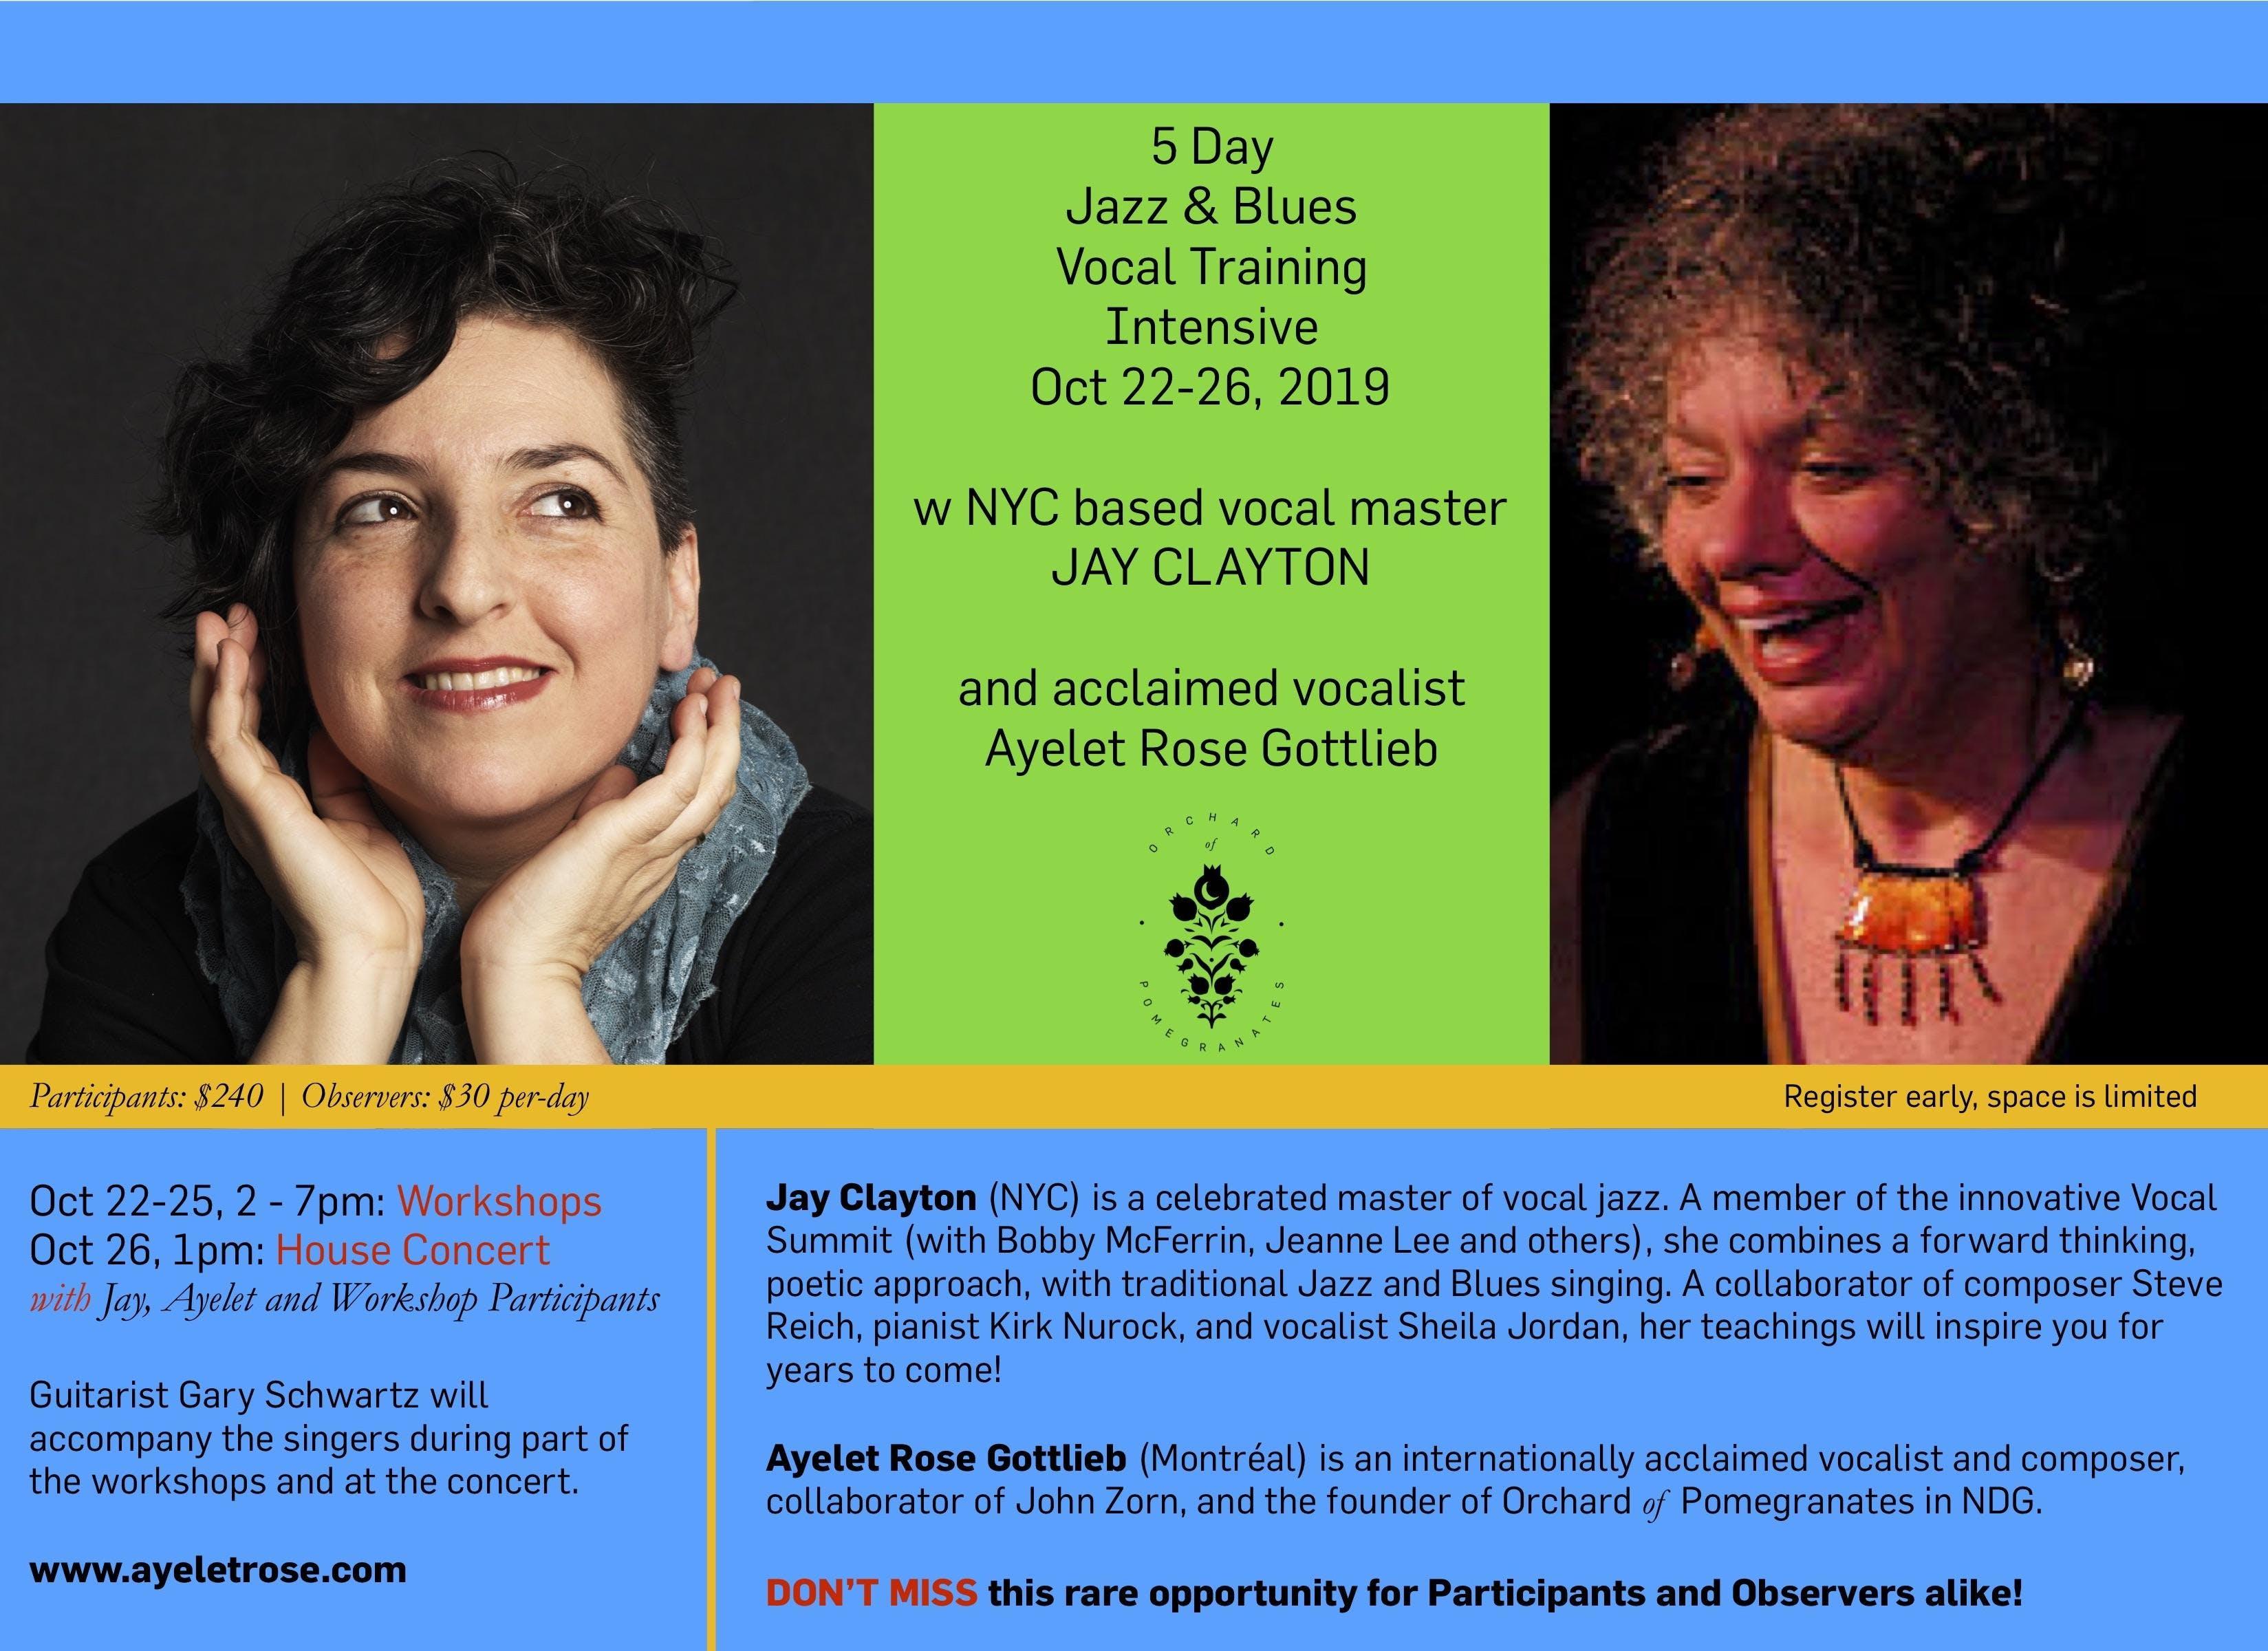 Jay Clayton & Ayelet Rose - Jazz and Blues Intensive!